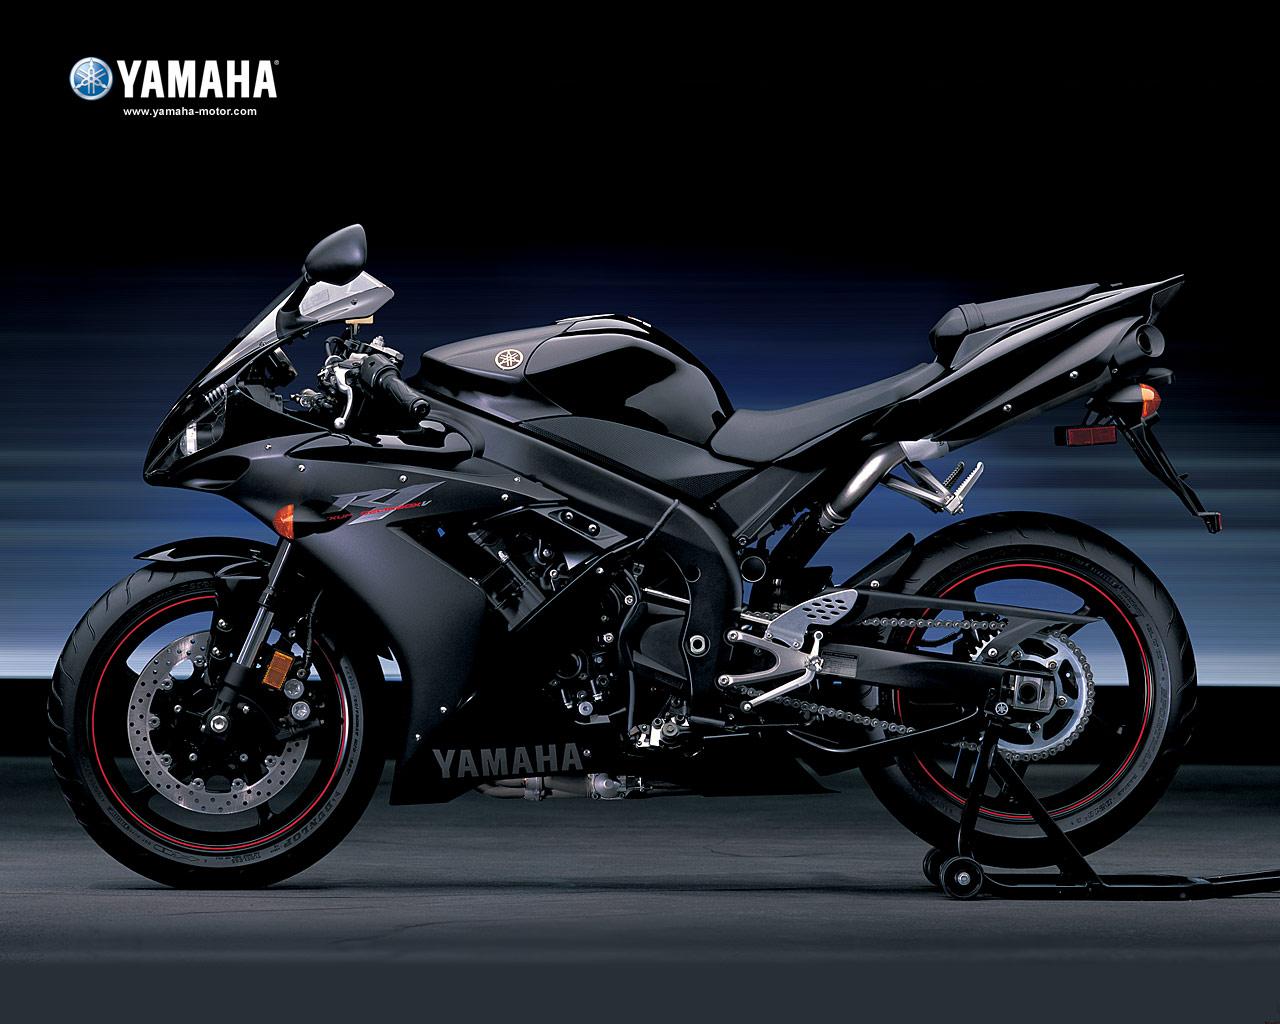 http://1.bp.blogspot.com/-kMXXgg8kmsM/T3l14XzAB0I/AAAAAAAABzM/krzWvtg_w48/s1600/Wallpaper+Yamaha+R1.jpg